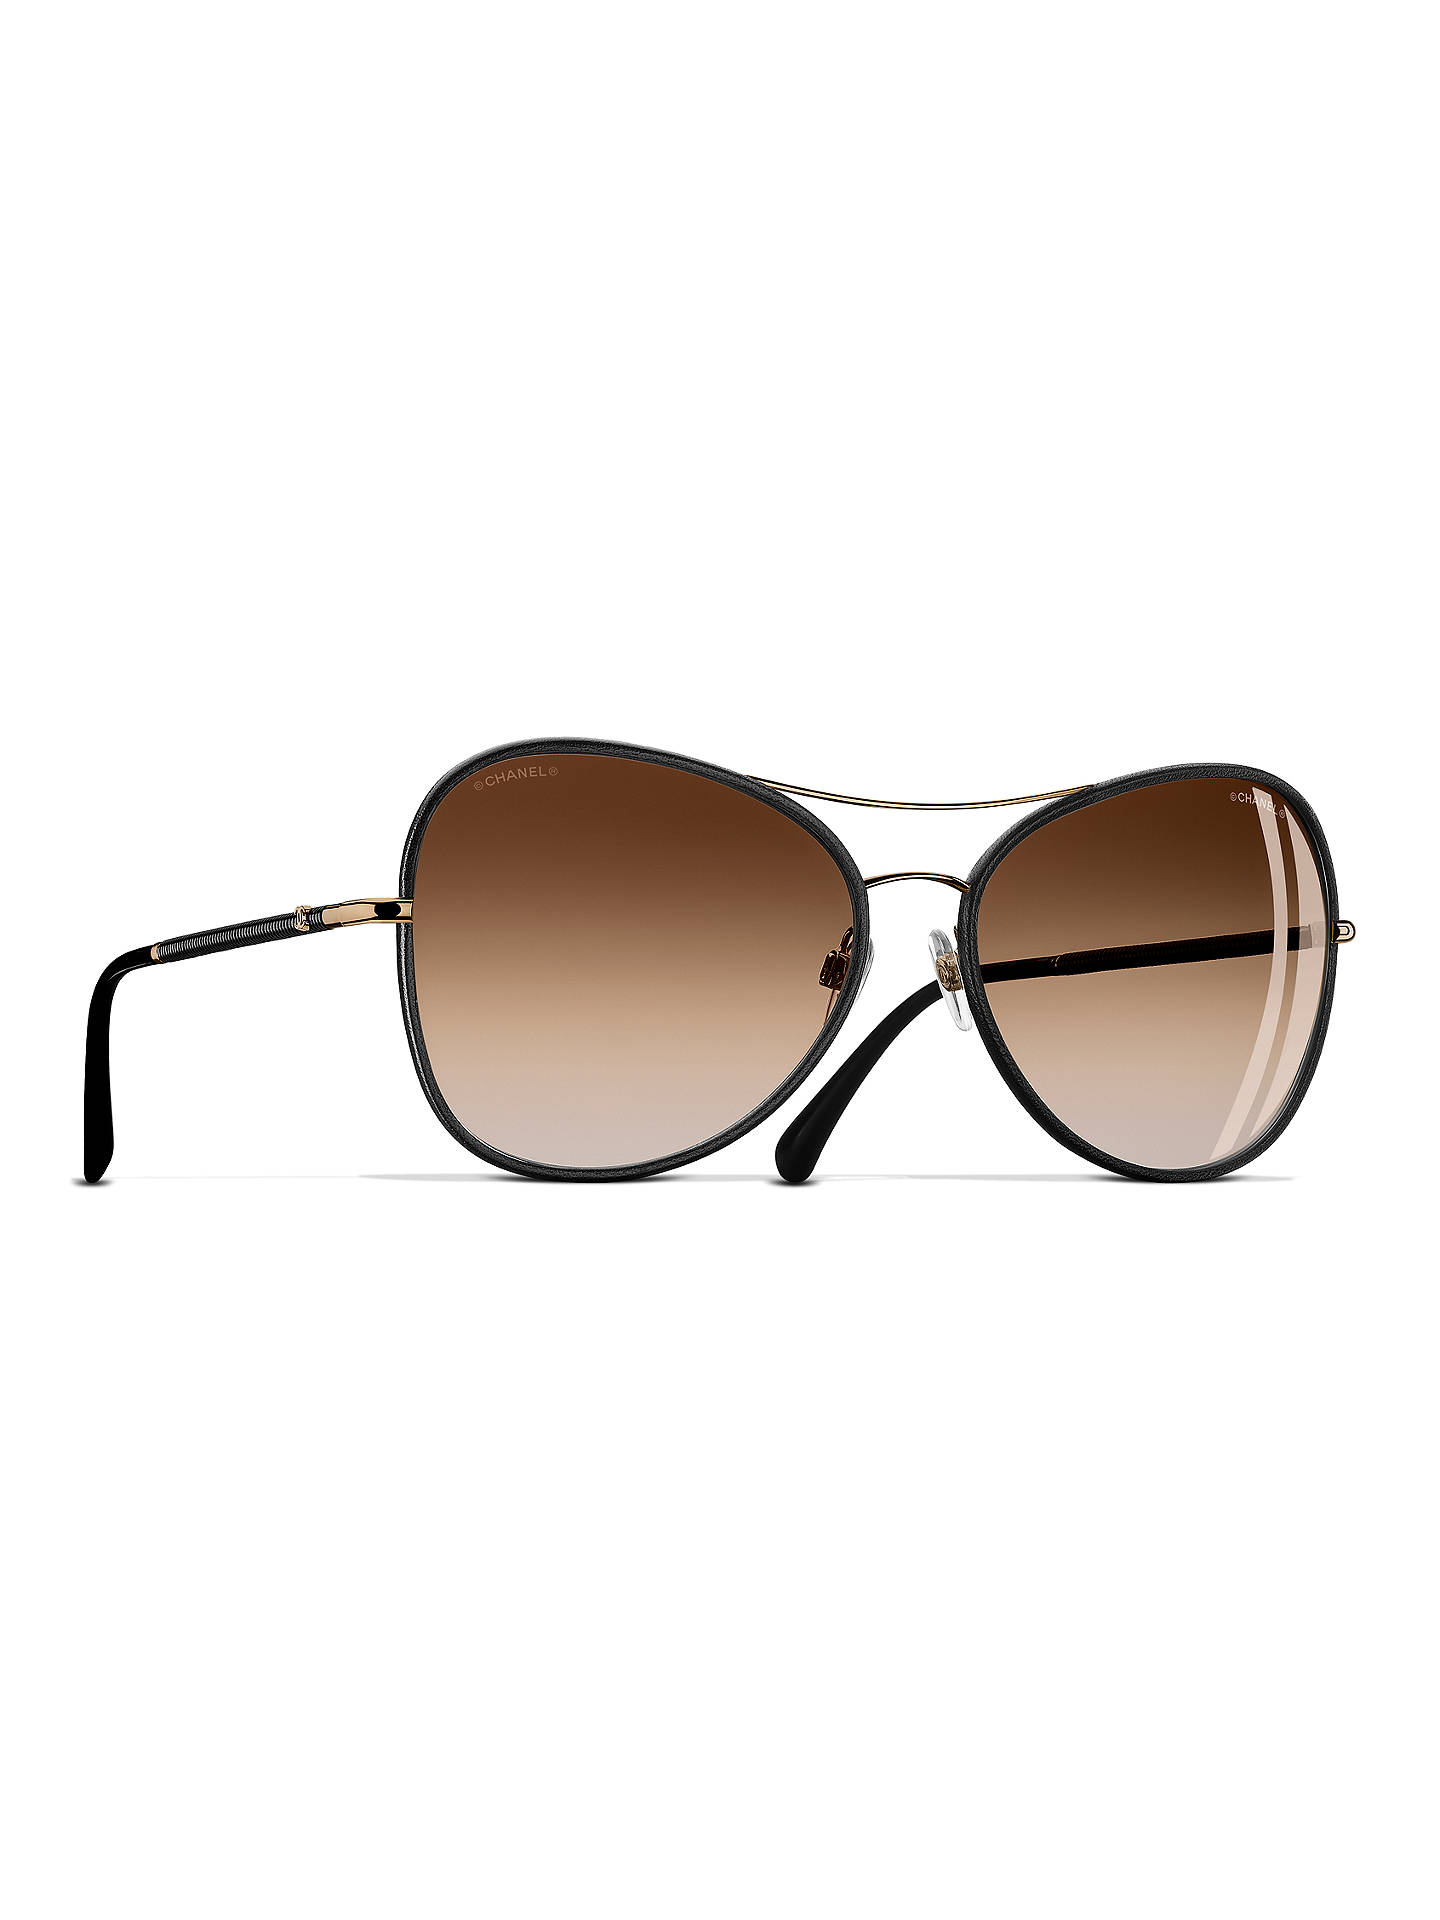 a668cfc09c BuyCHANEL Pilot Sunglasses CH4227Q Black Gold Online at johnlewis.com ...